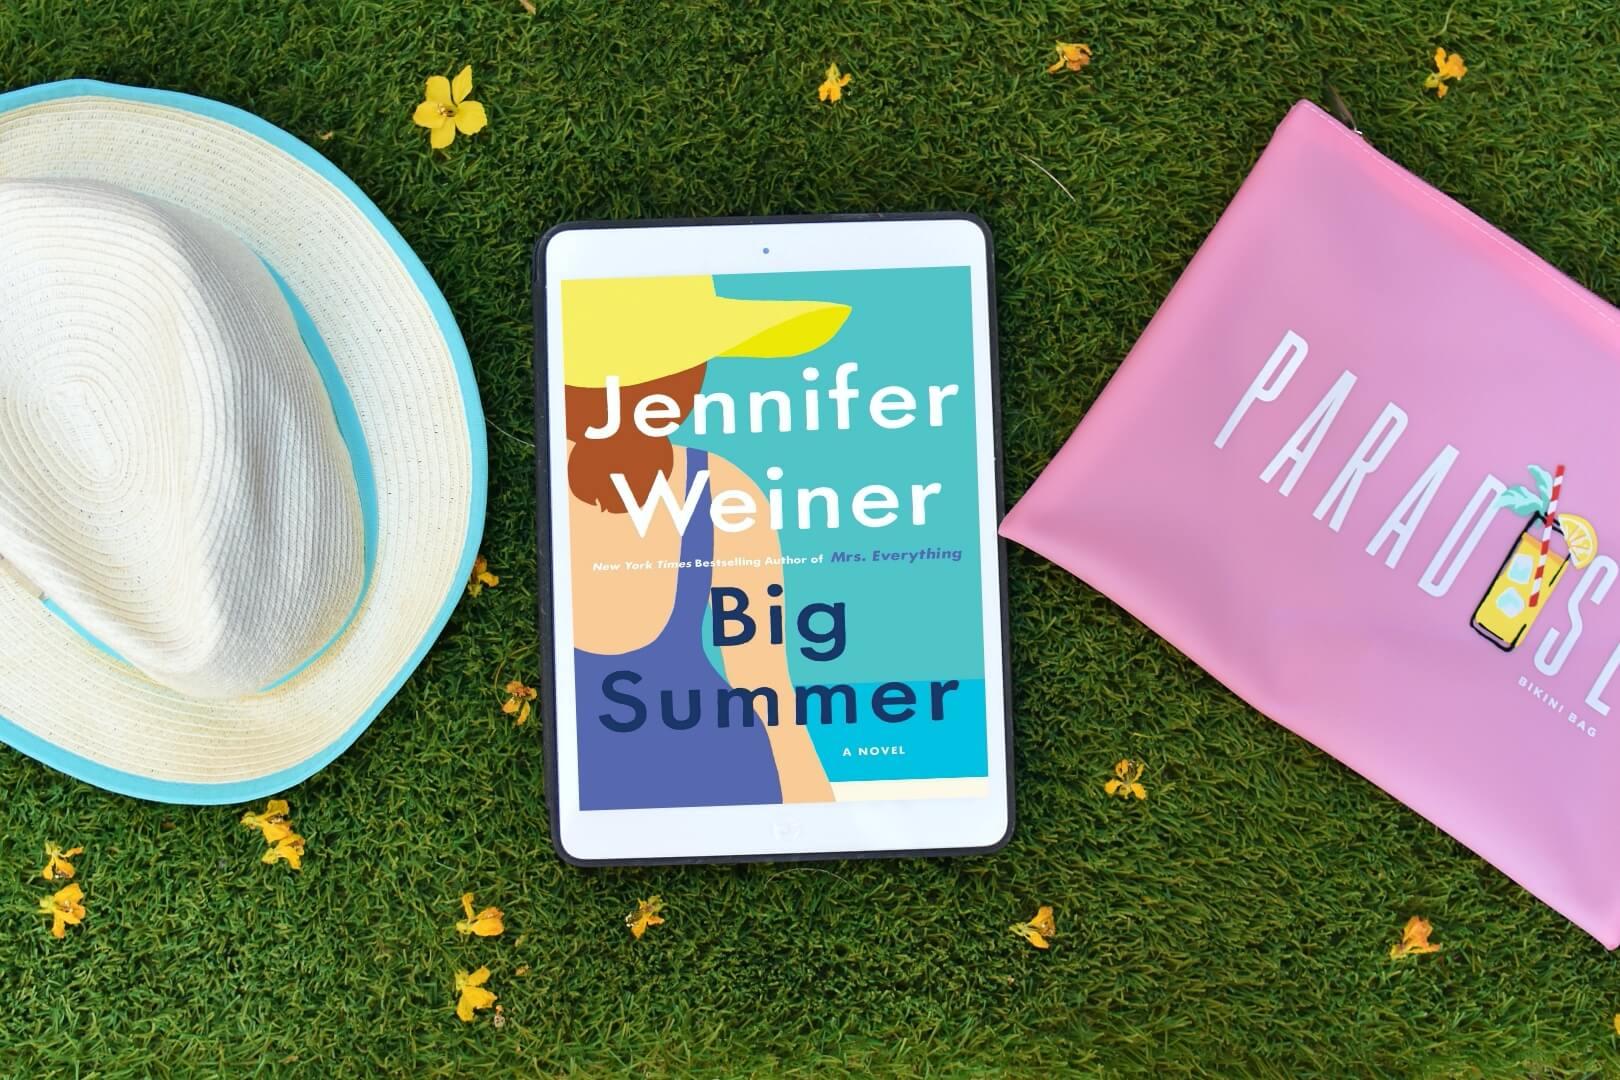 book club questions big summer - book club chat